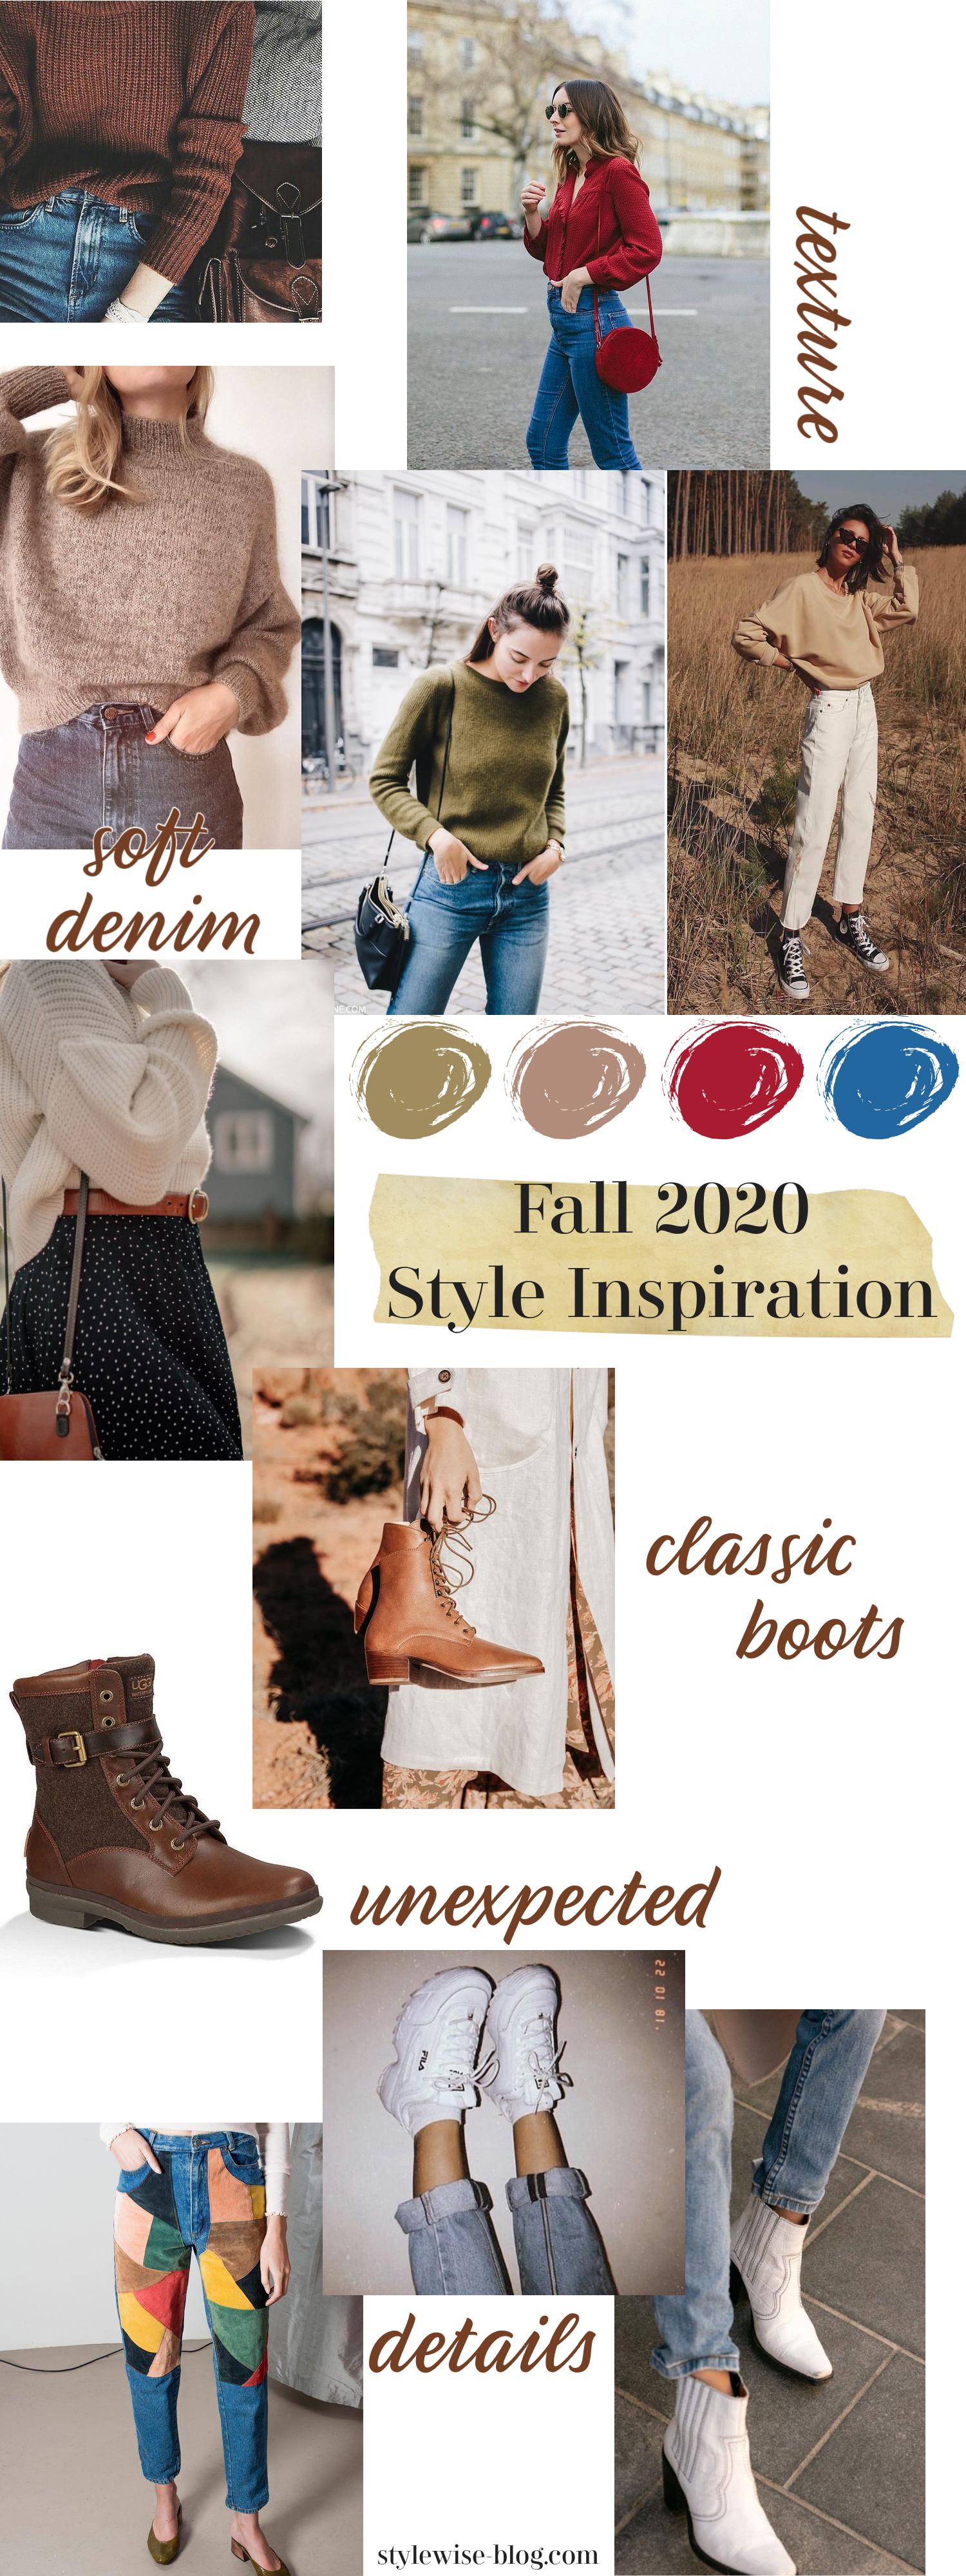 sustainable fashion fall 2020 style inspiration